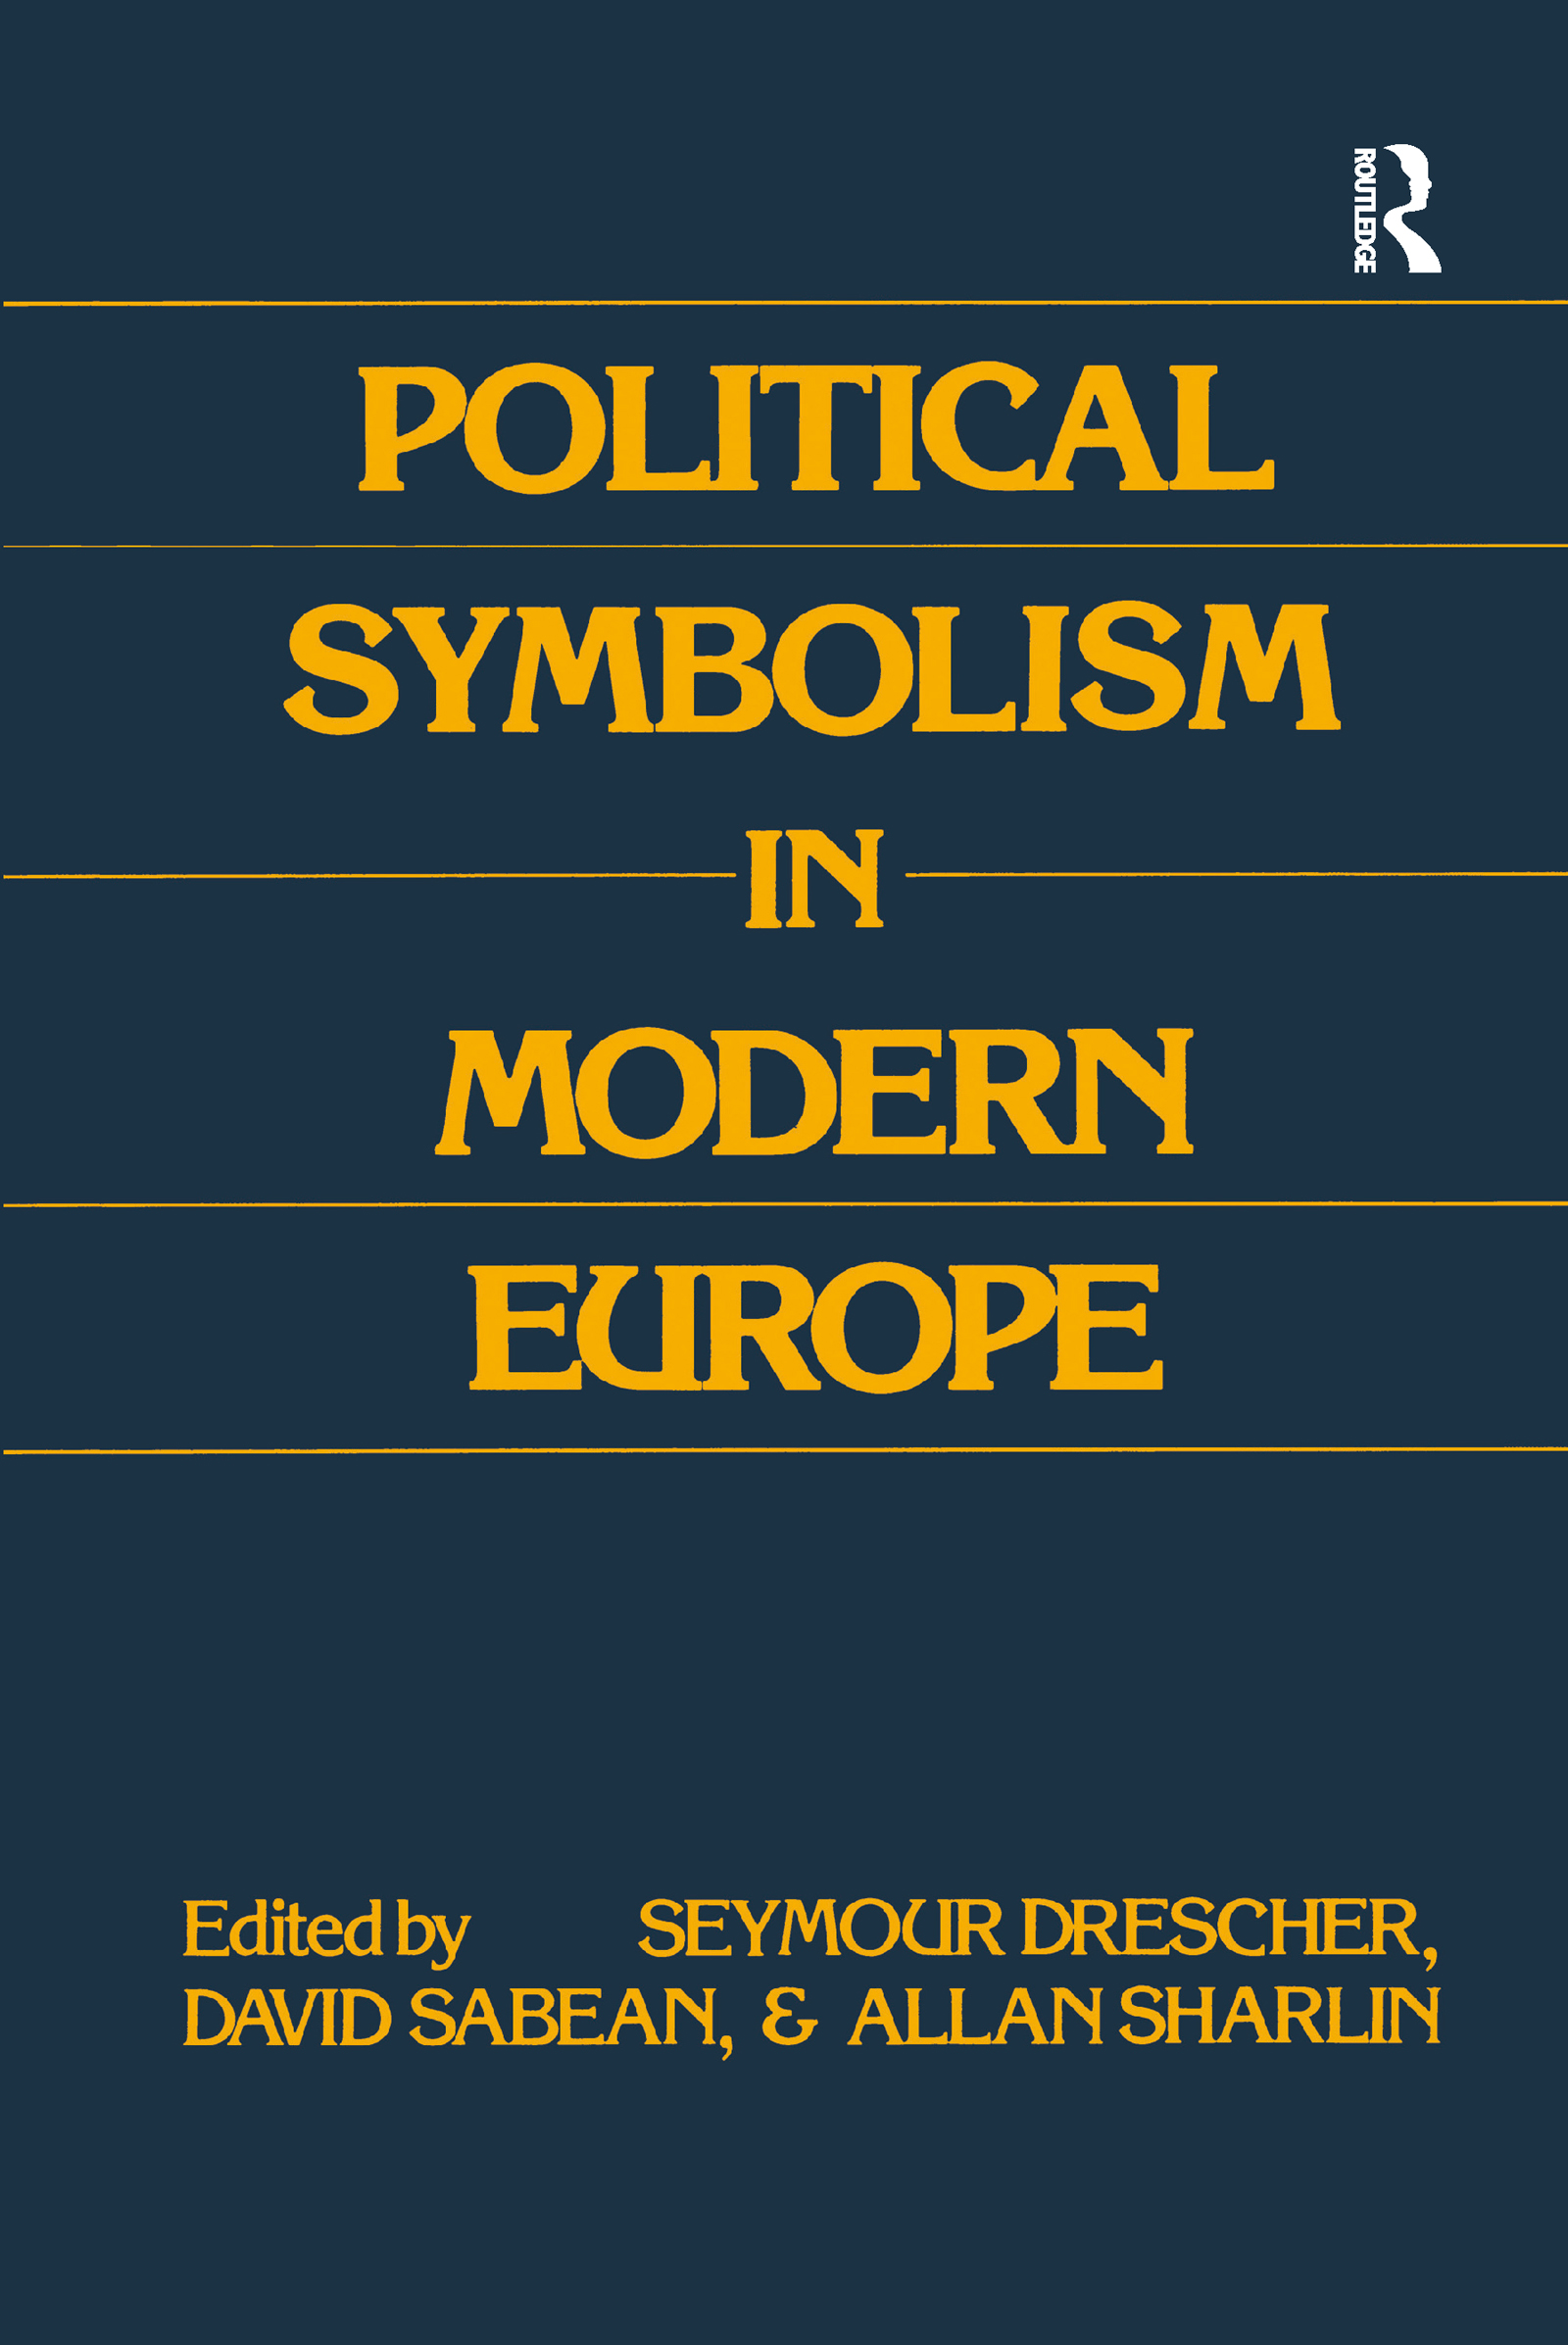 Political Symbolism in Modern Europe